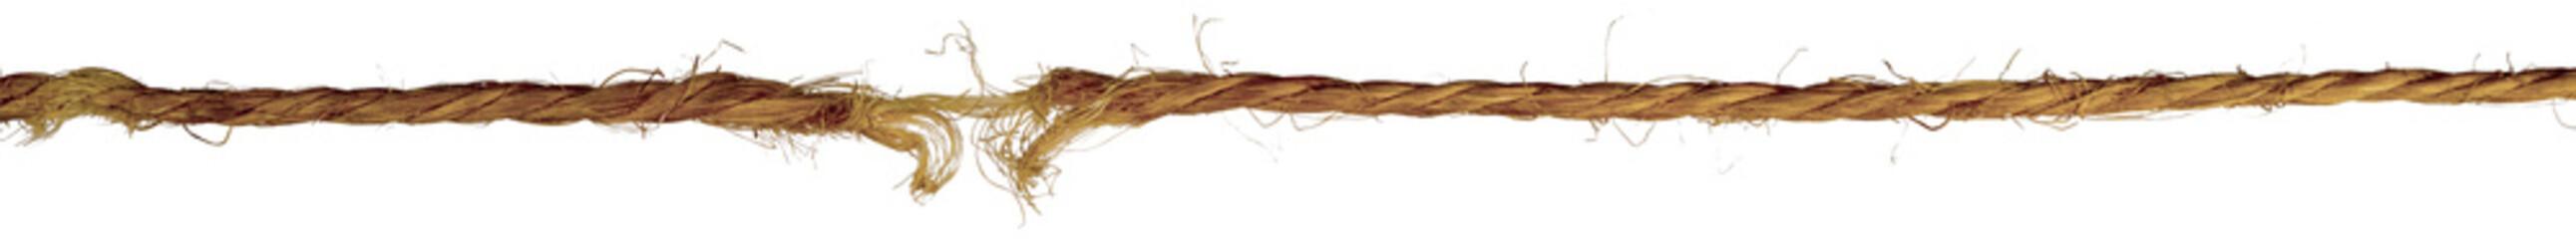 old twisted frayed rope isolated on white background